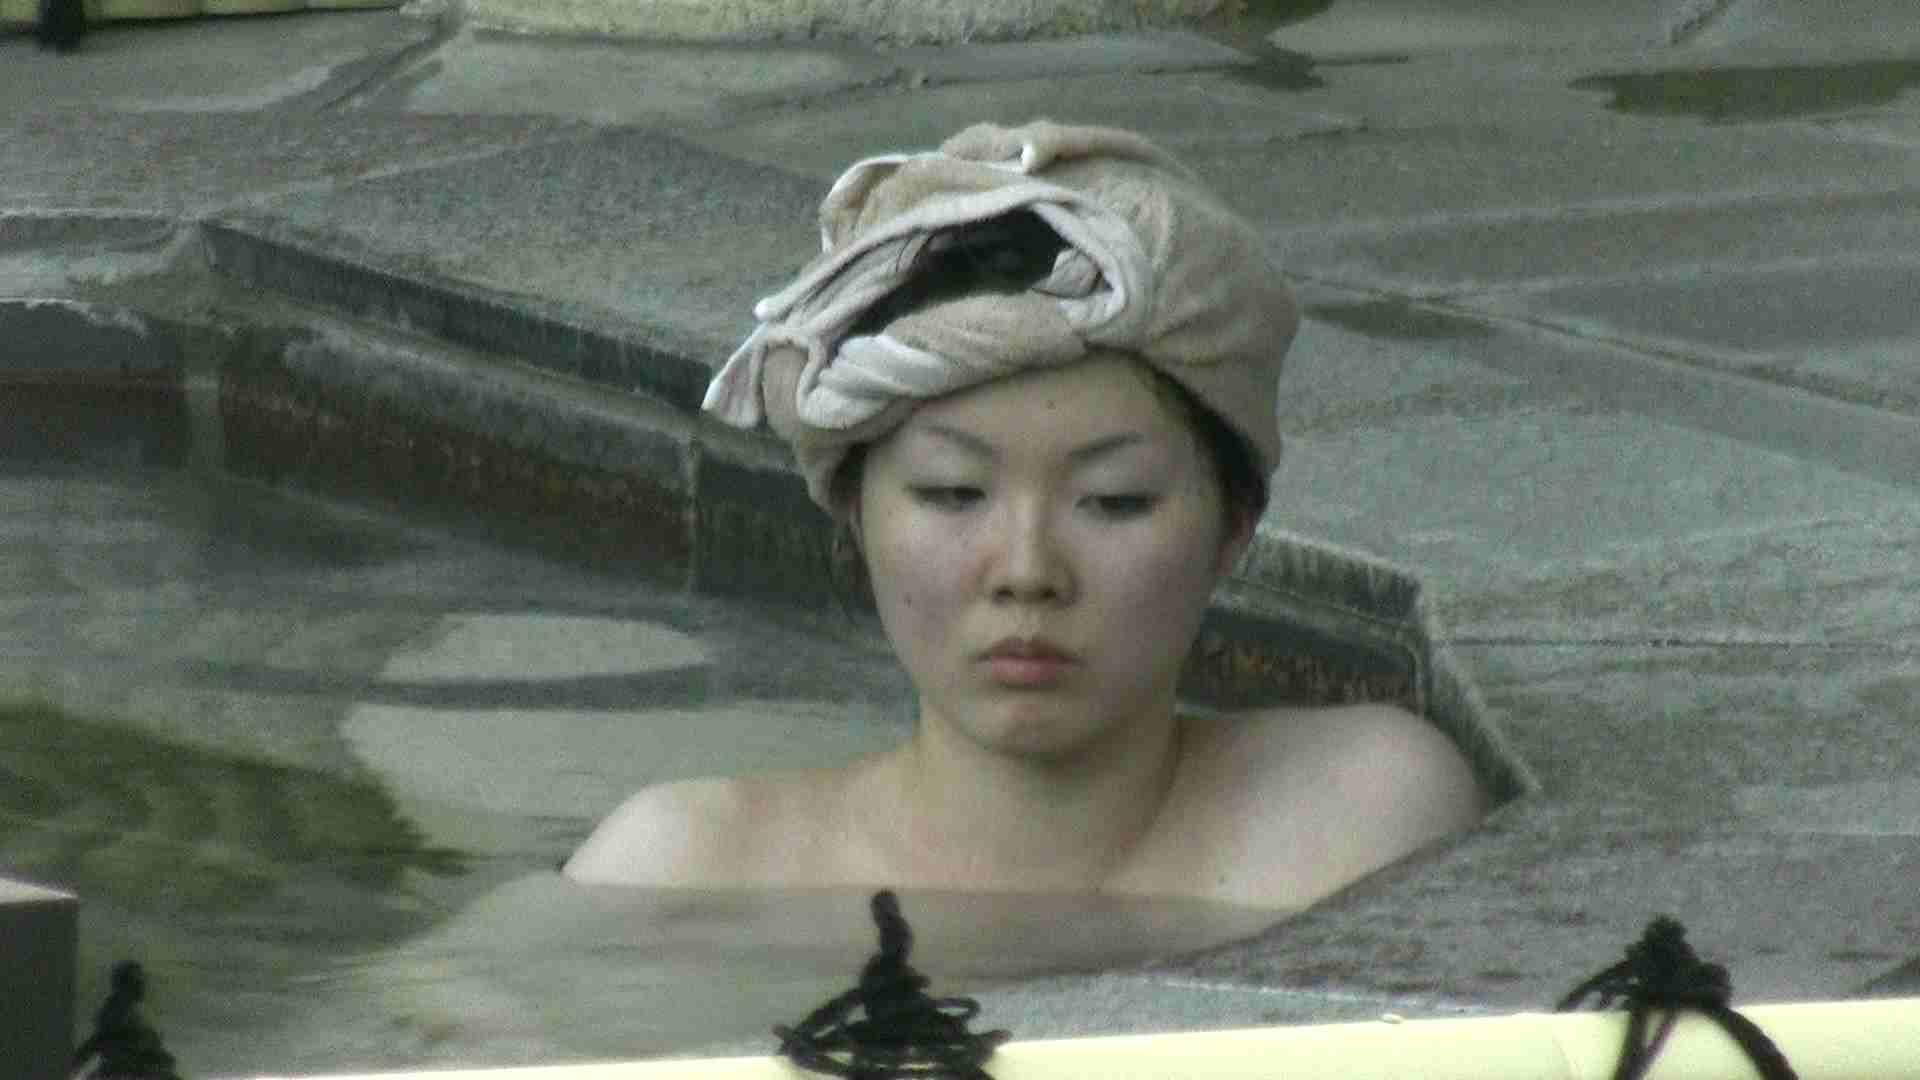 Aquaな露天風呂Vol.191 露天 | OL女体  72連発 67